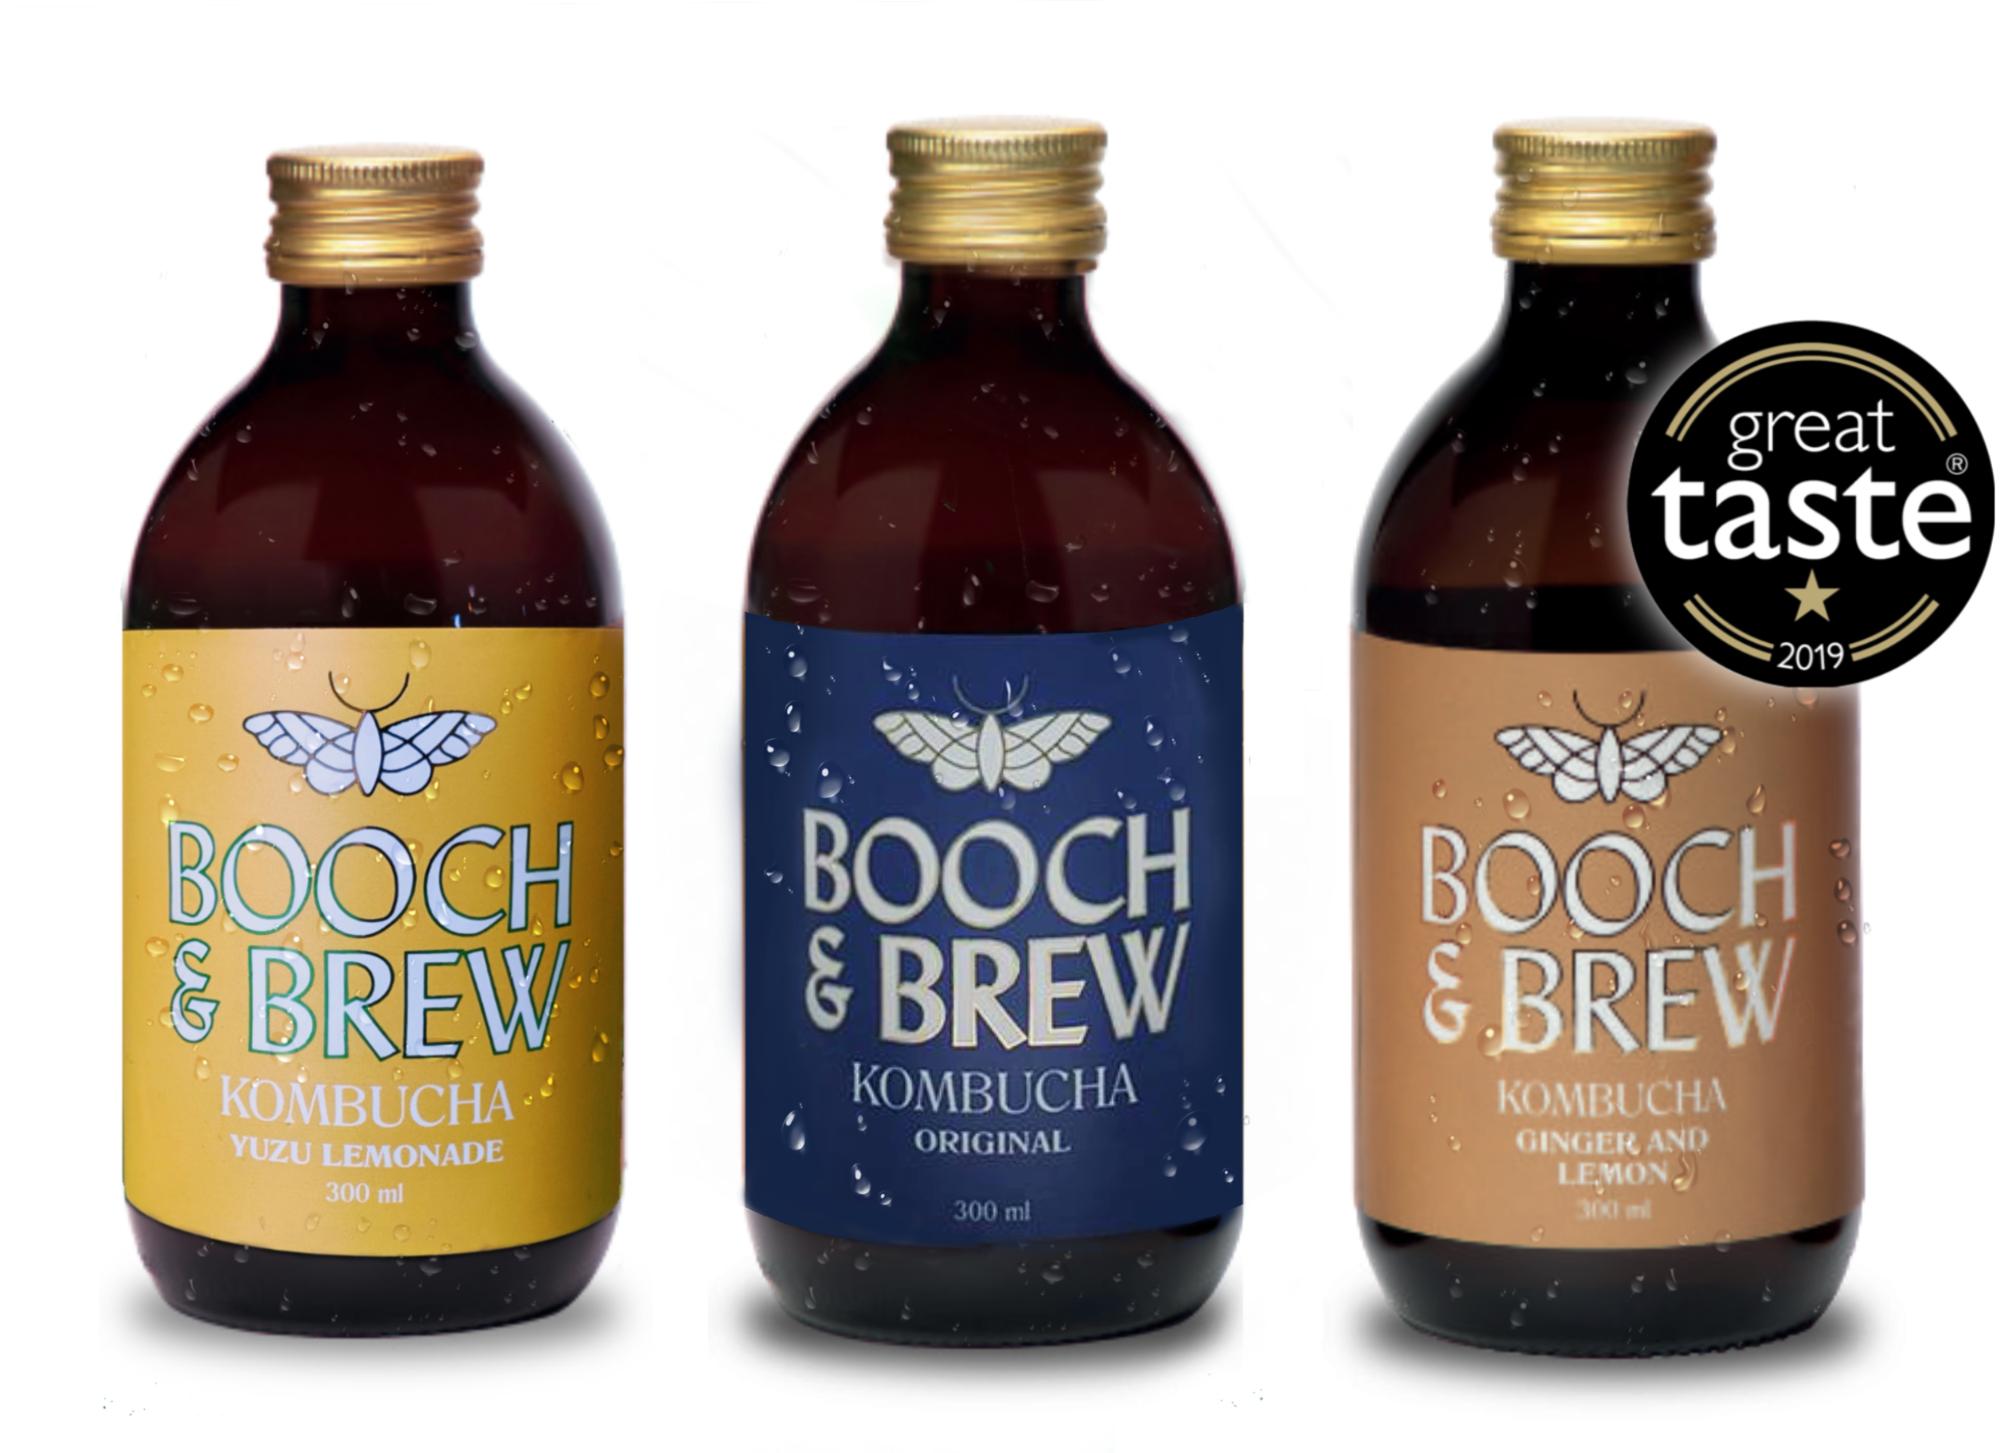 Mixed 12 case of Booch & Brew Kombucha - The Alcohol Free Co